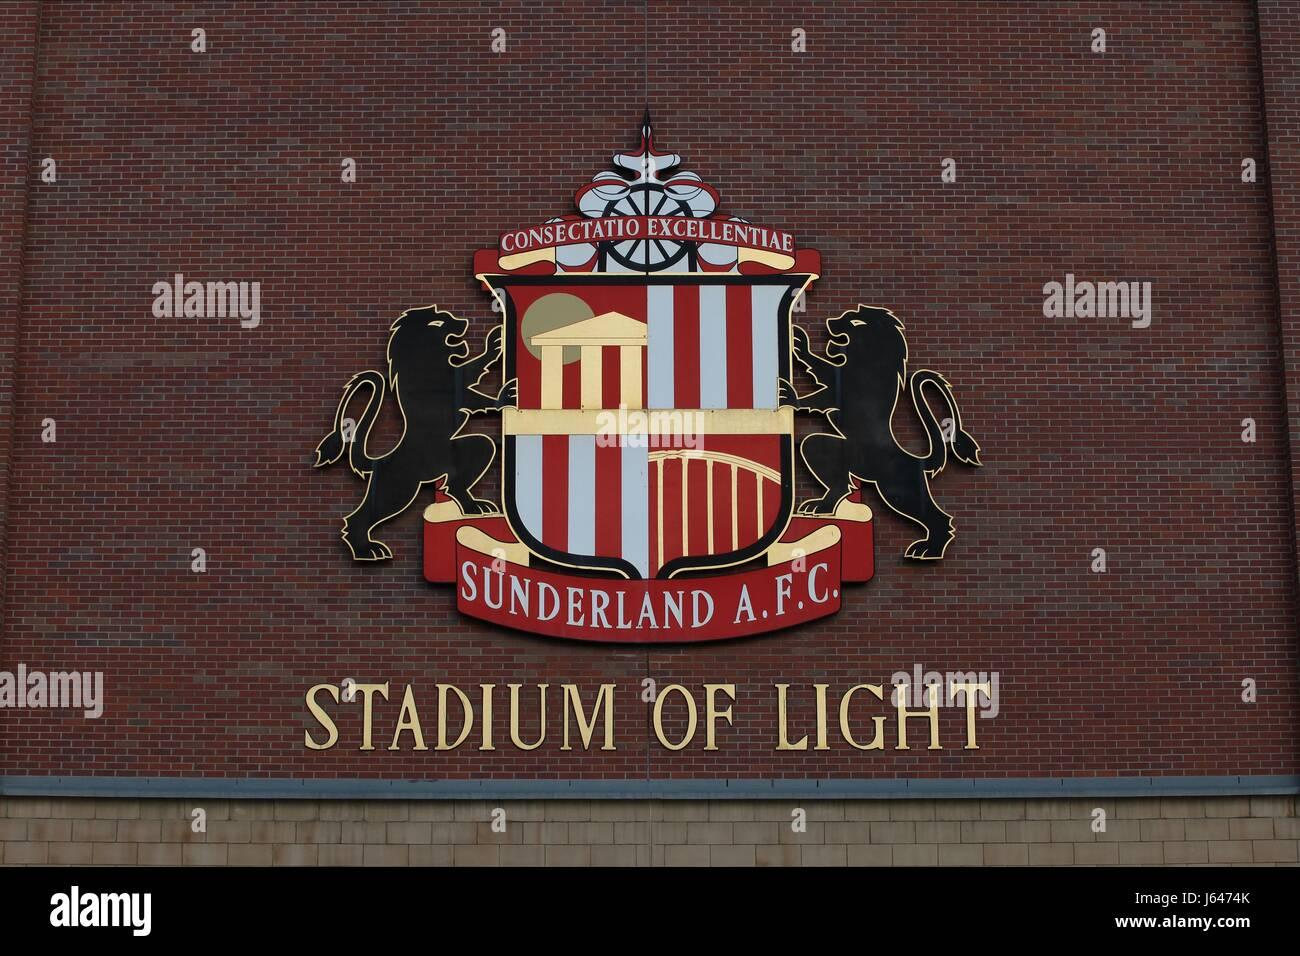 SUNDERLAND EMBLEM STADIUM OF LIGHT SUNDERLAND AFC STADIUM OF LIGHT SUNDERLAND STADIUM OF LIGHT SUNDERLAND ENGLAND - Stock Image